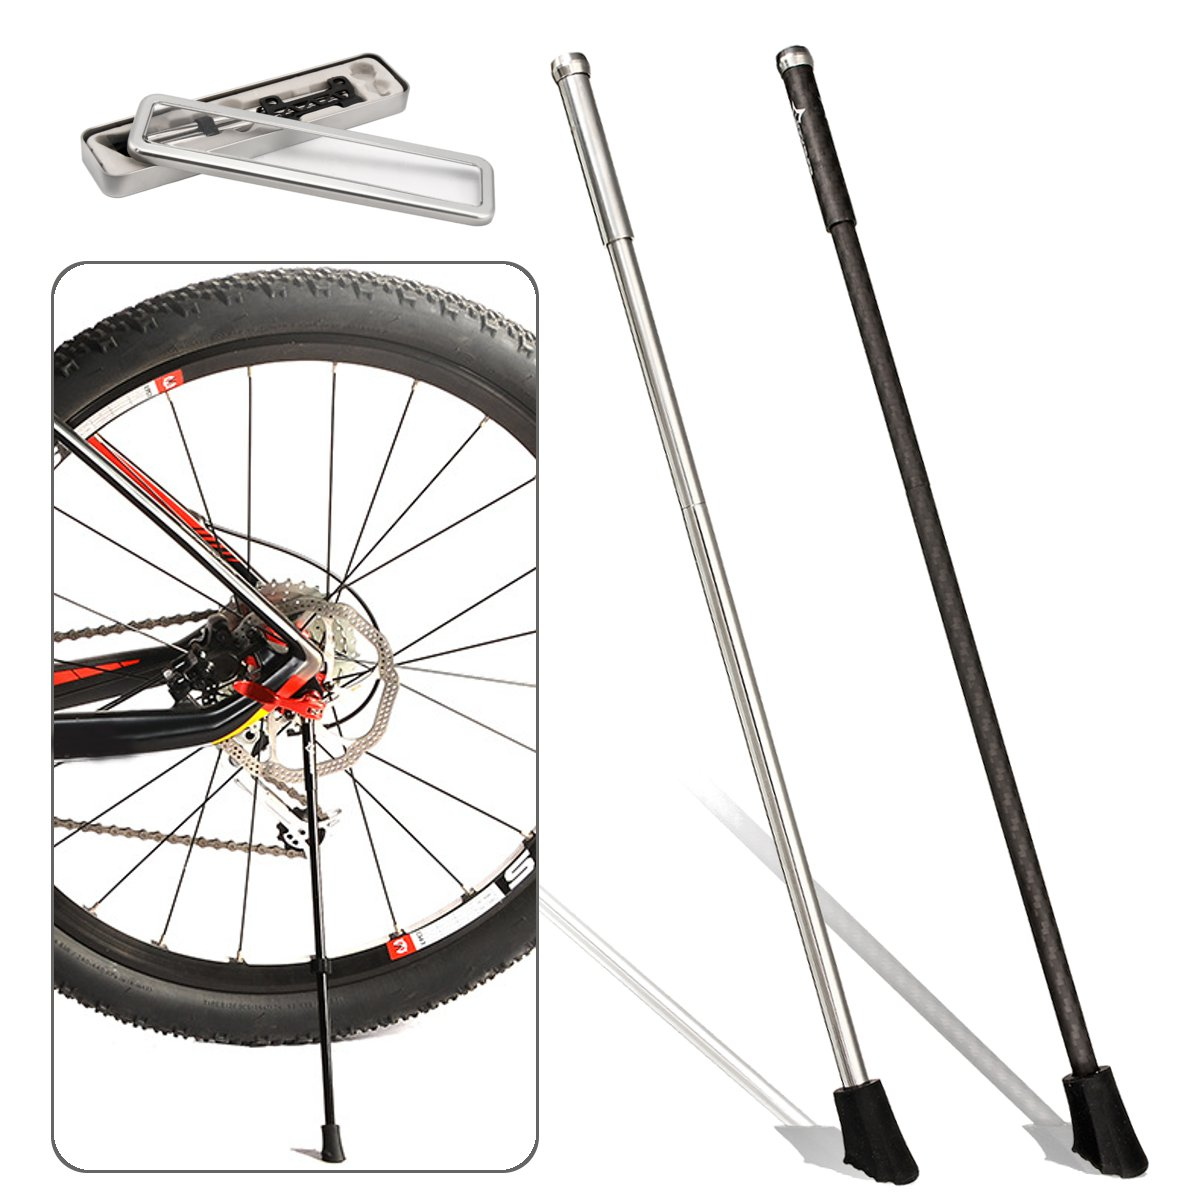 RockBros Bike Folding Stand Stainless Steel Quick Release Axle Skewer Kickstand